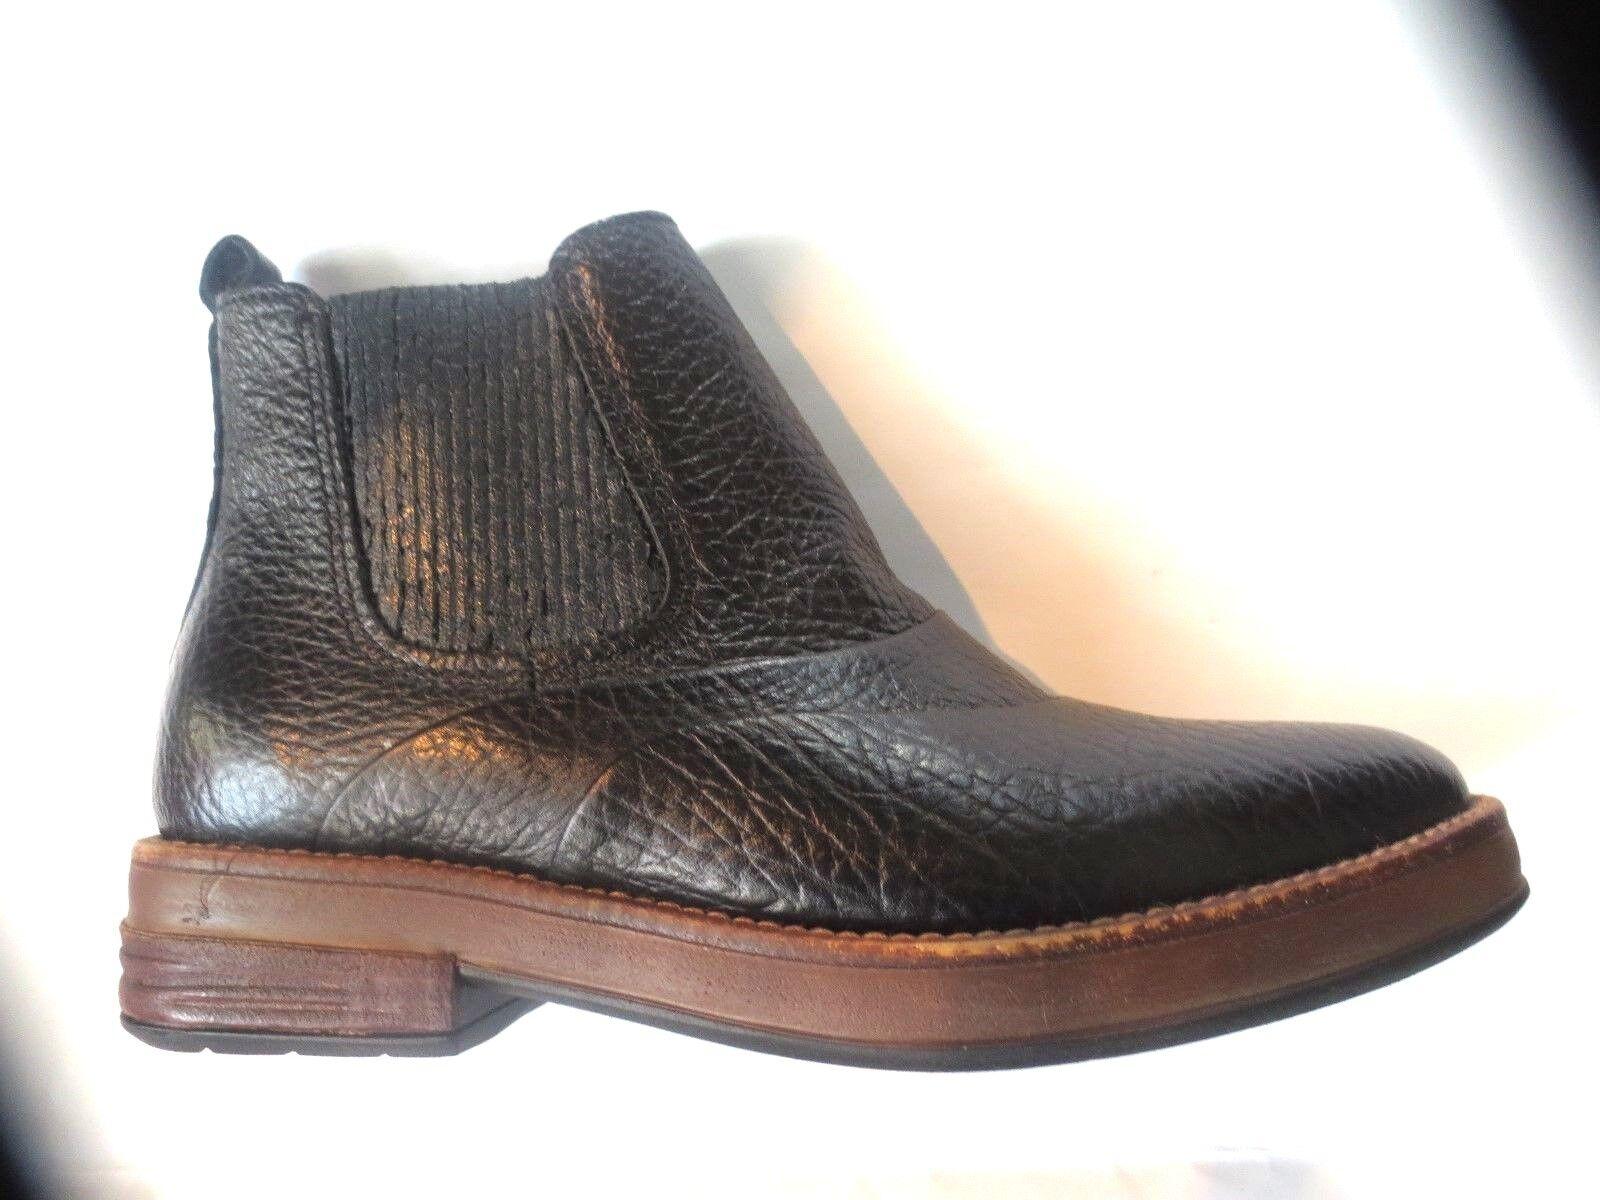 Mjus Stiefel Leder Schwarz Neu Wert 159E Schuhgrößen 36,37, 39